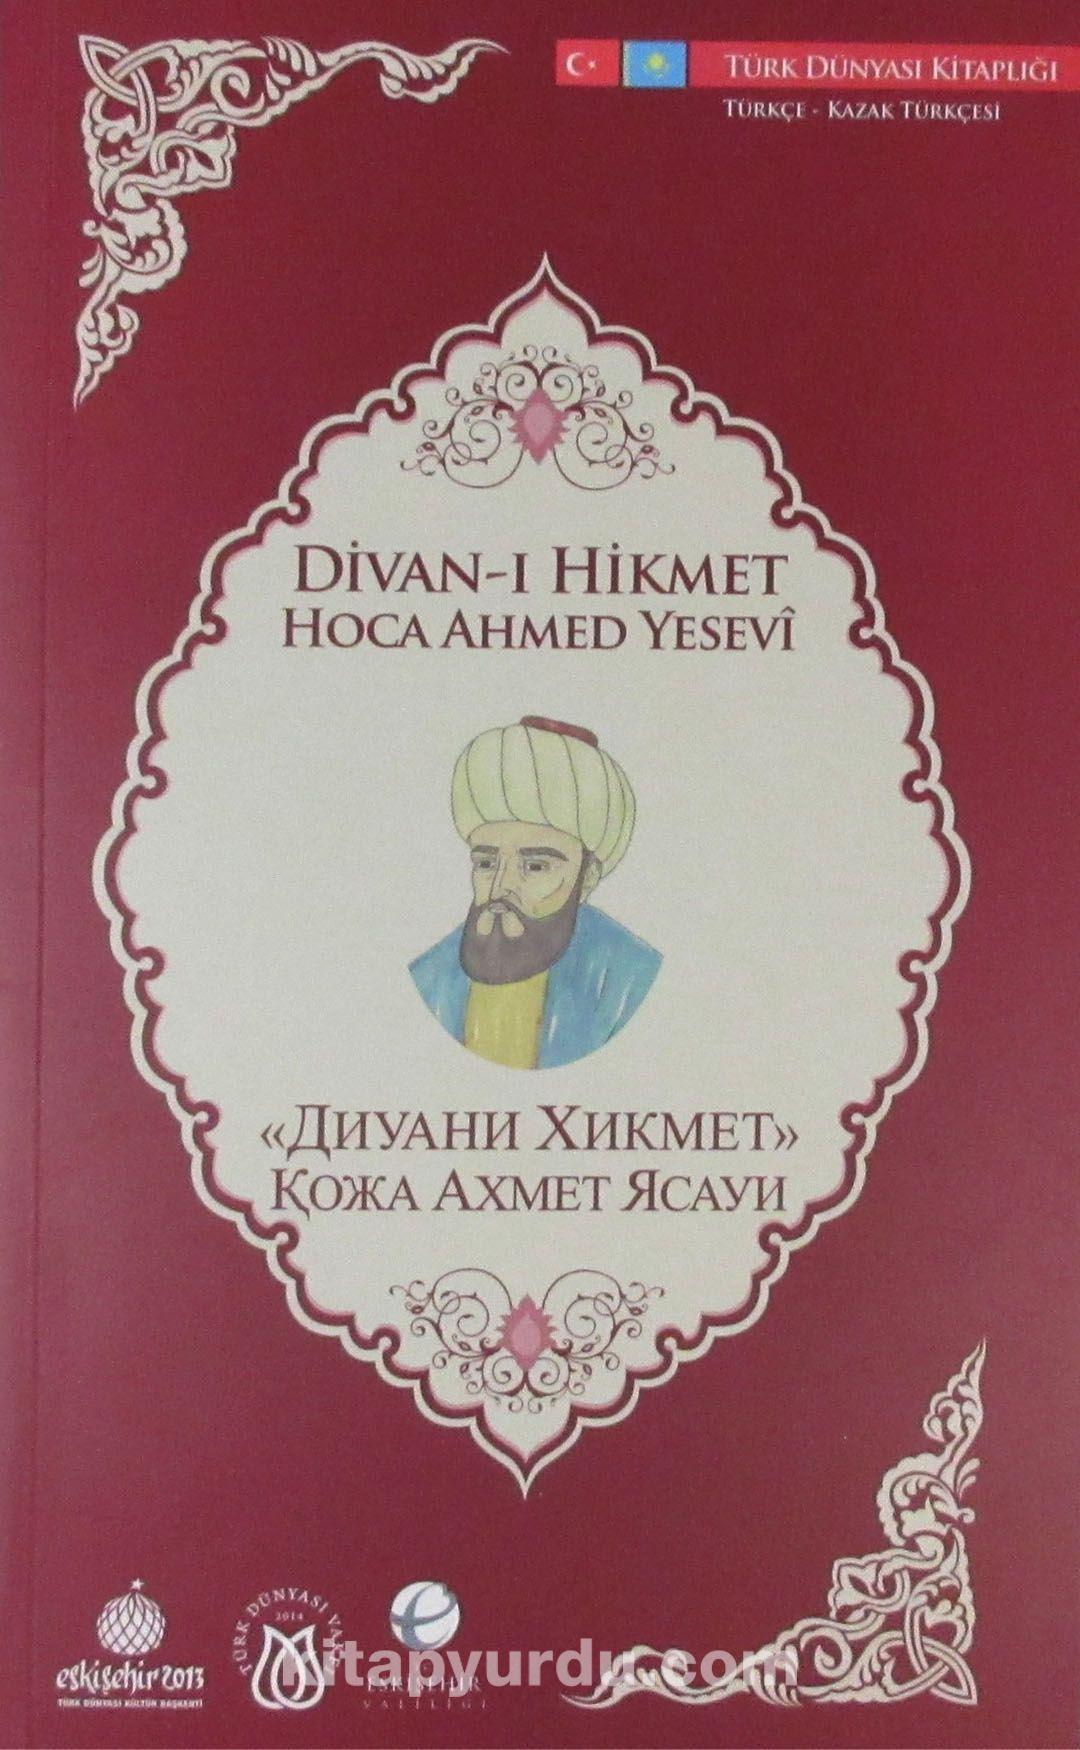 Divan-ı Hikmet (Türkçe-Kazak Türkçesi) - Ahmed Çelebi pdf epub